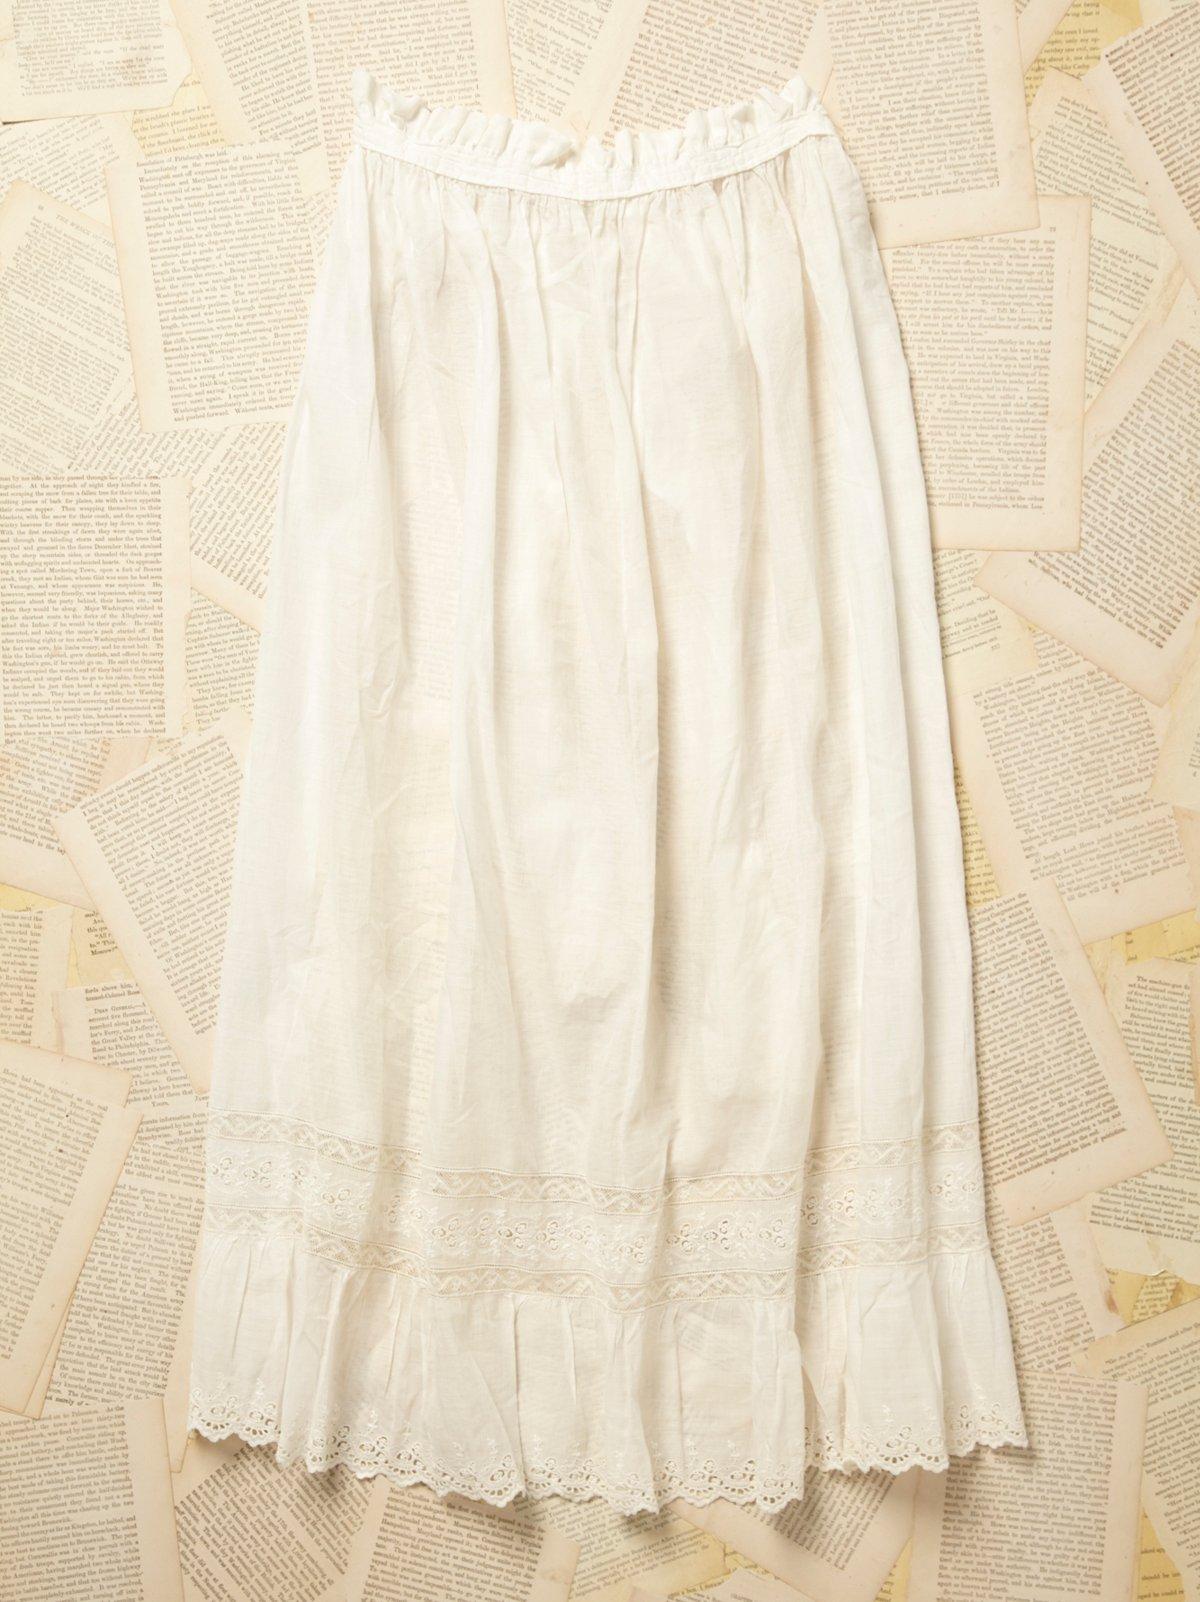 Vintage Victorian White Cotton Apron